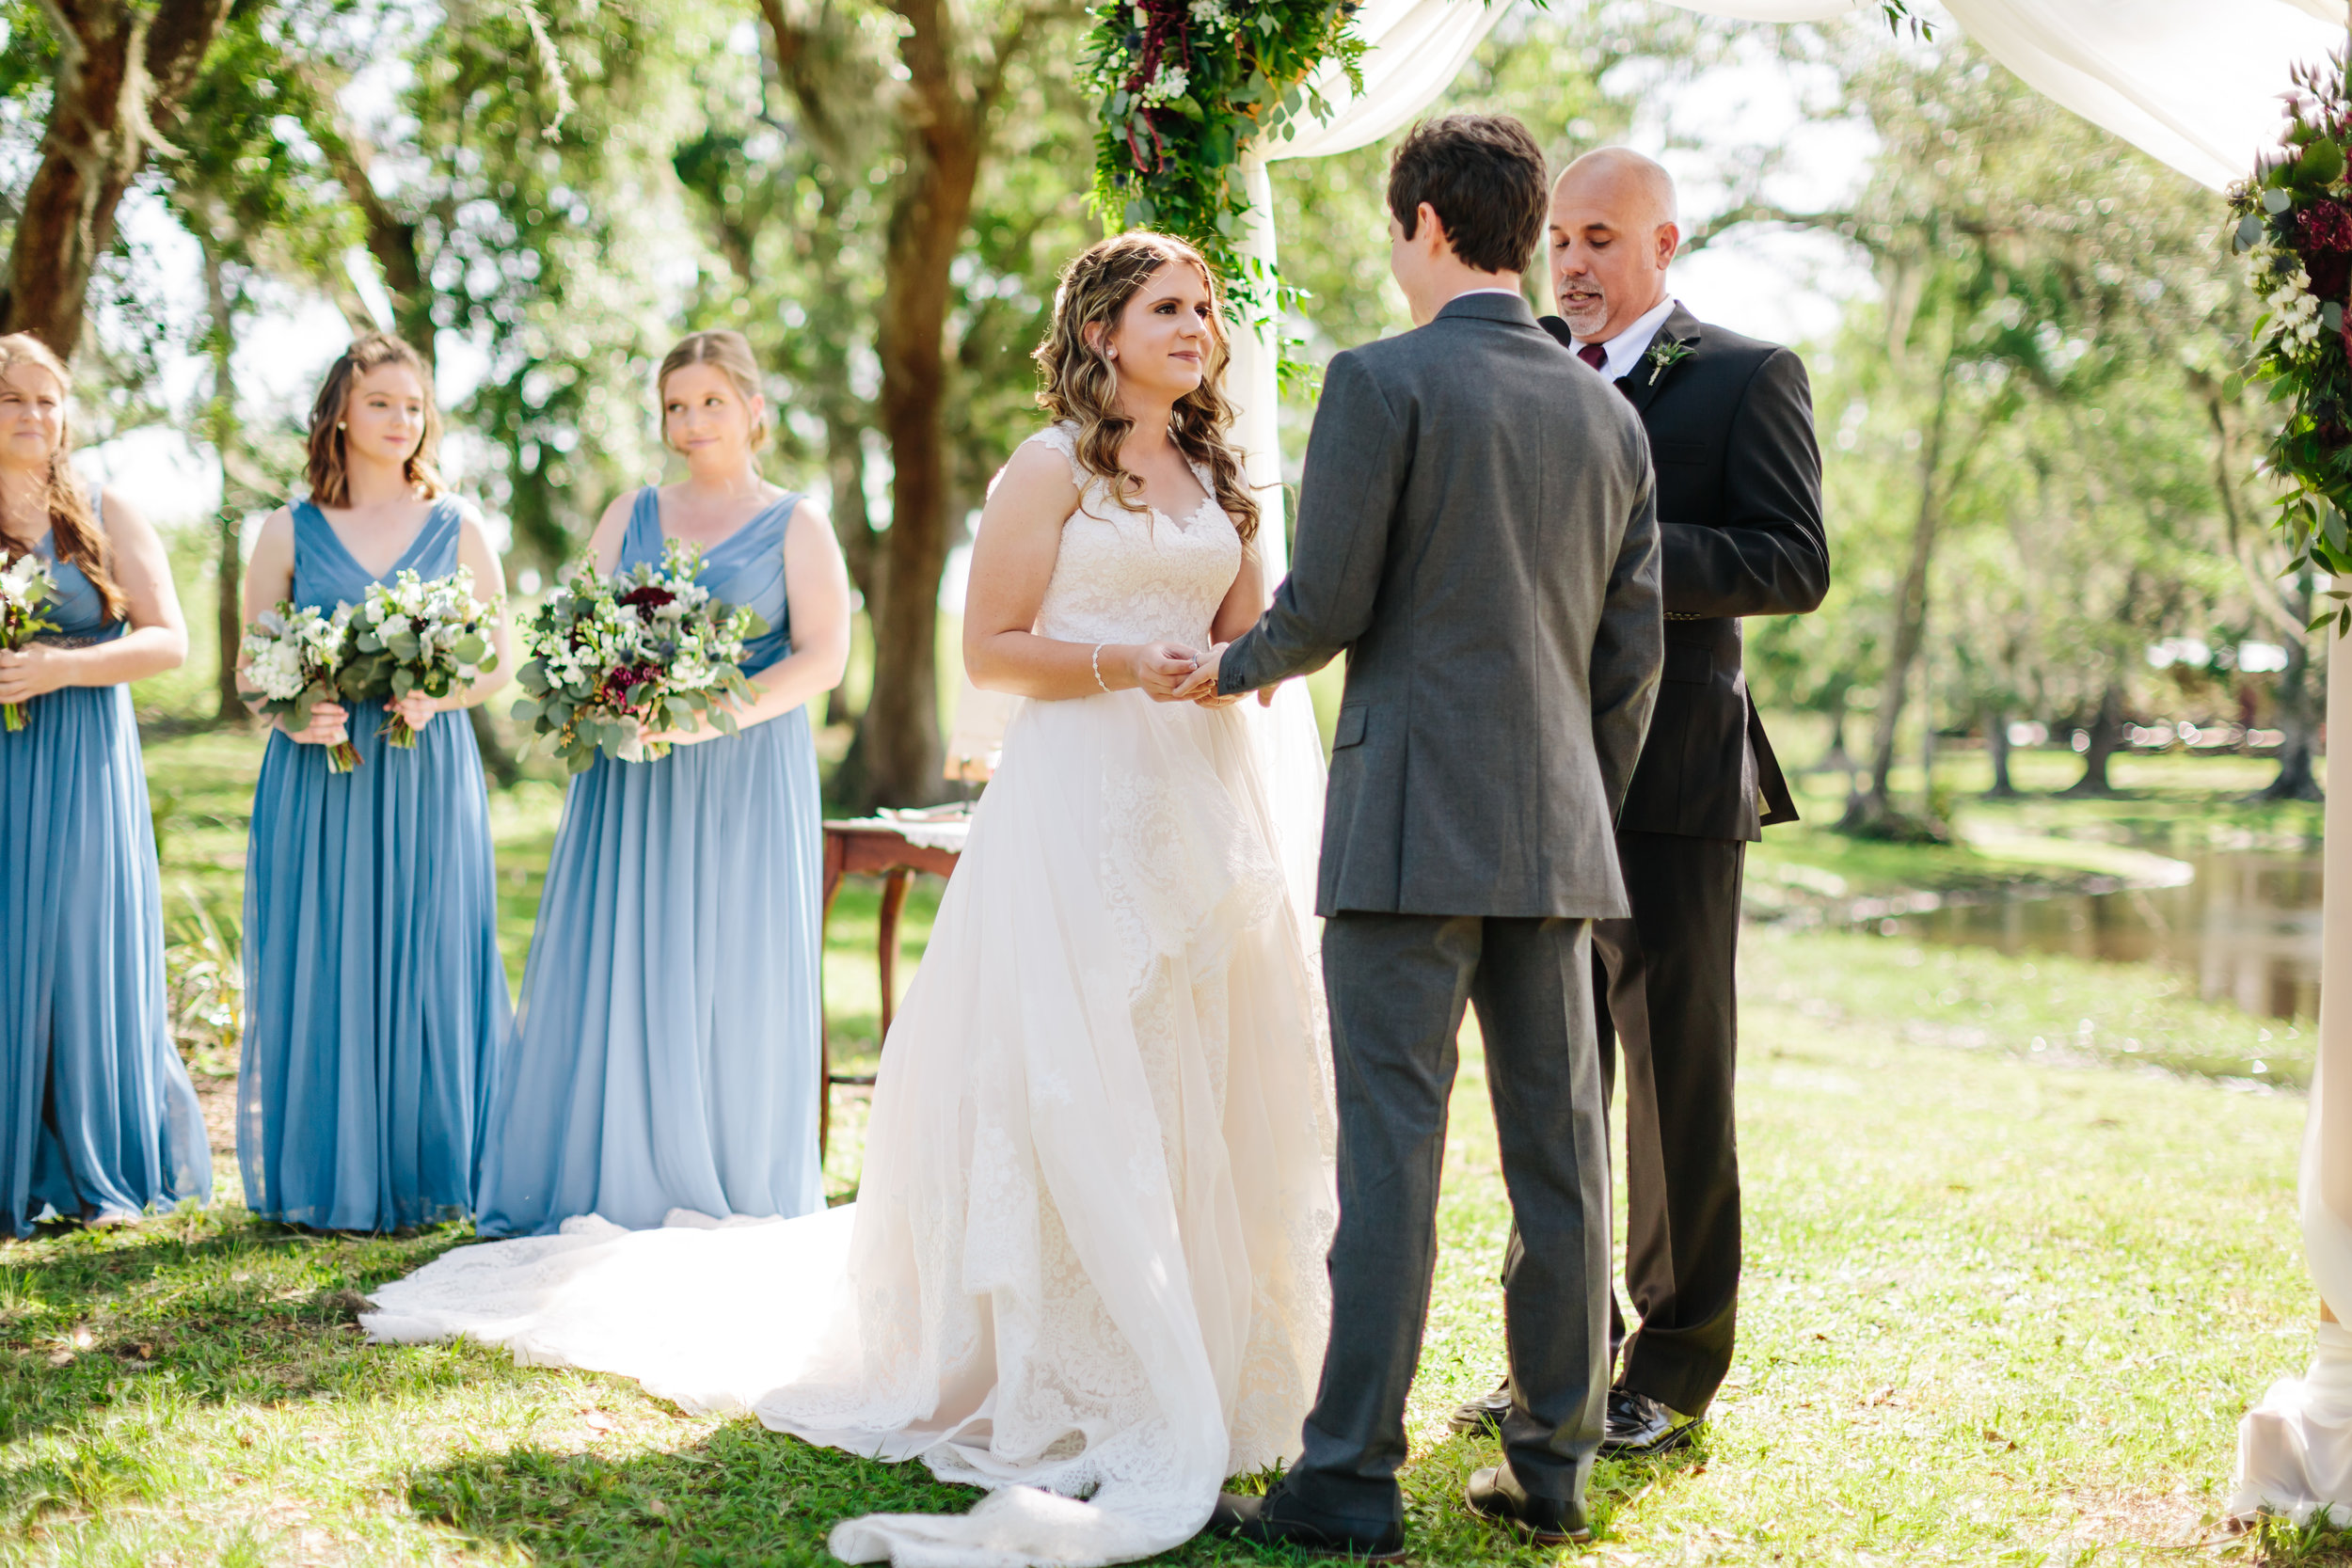 2018.04.14 Zak and Jamisyn Unrue Black Willow Barn Wedding Finals-377.jpg